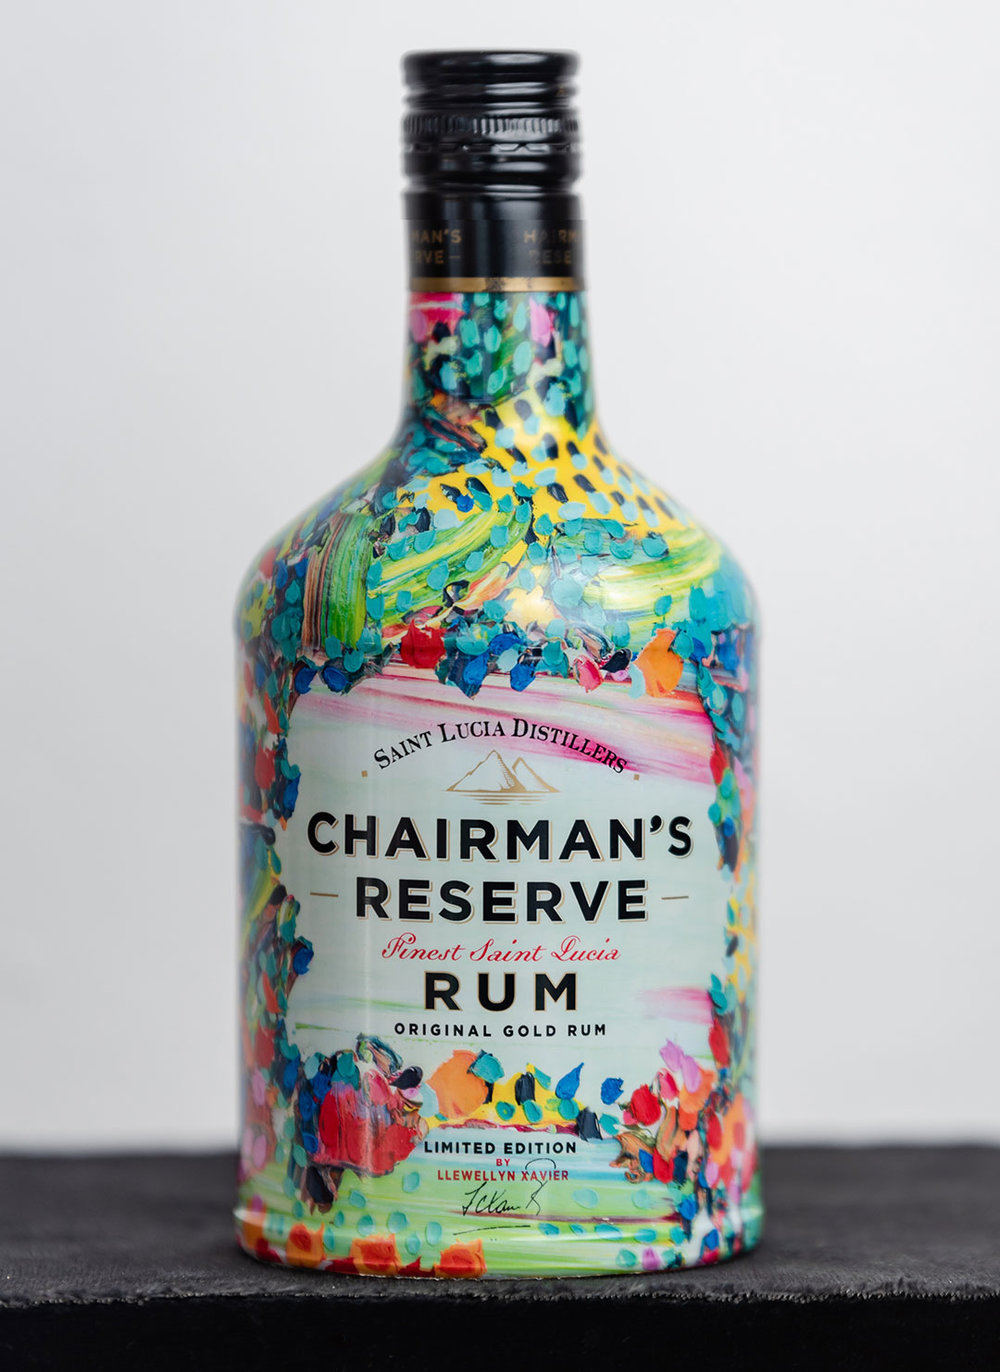 Chairmans-reserve-lx-launch-1.jpg